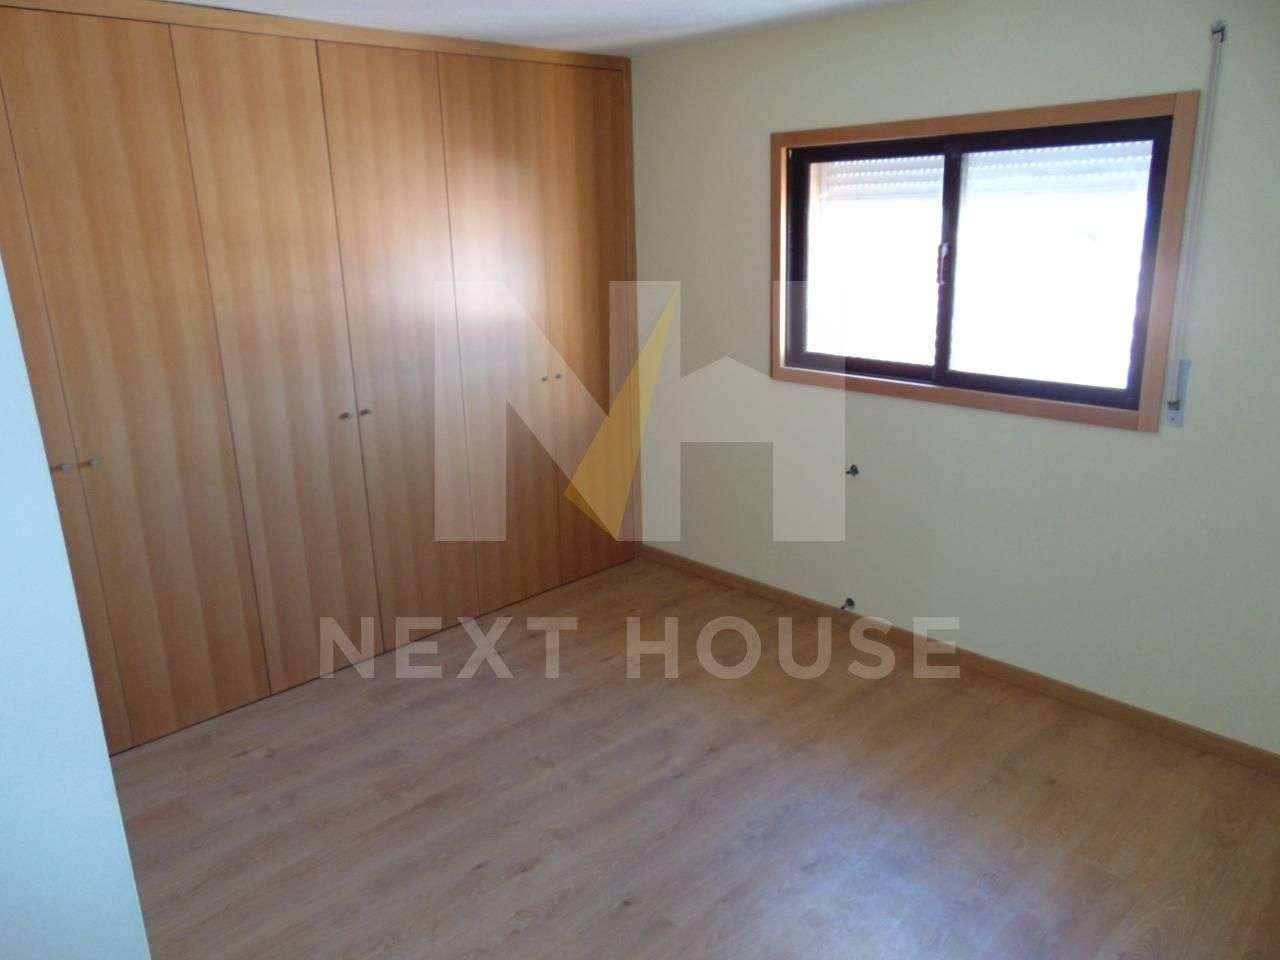 Apartamento para comprar, Gafanha da Boa Hora, Aveiro - Foto 12